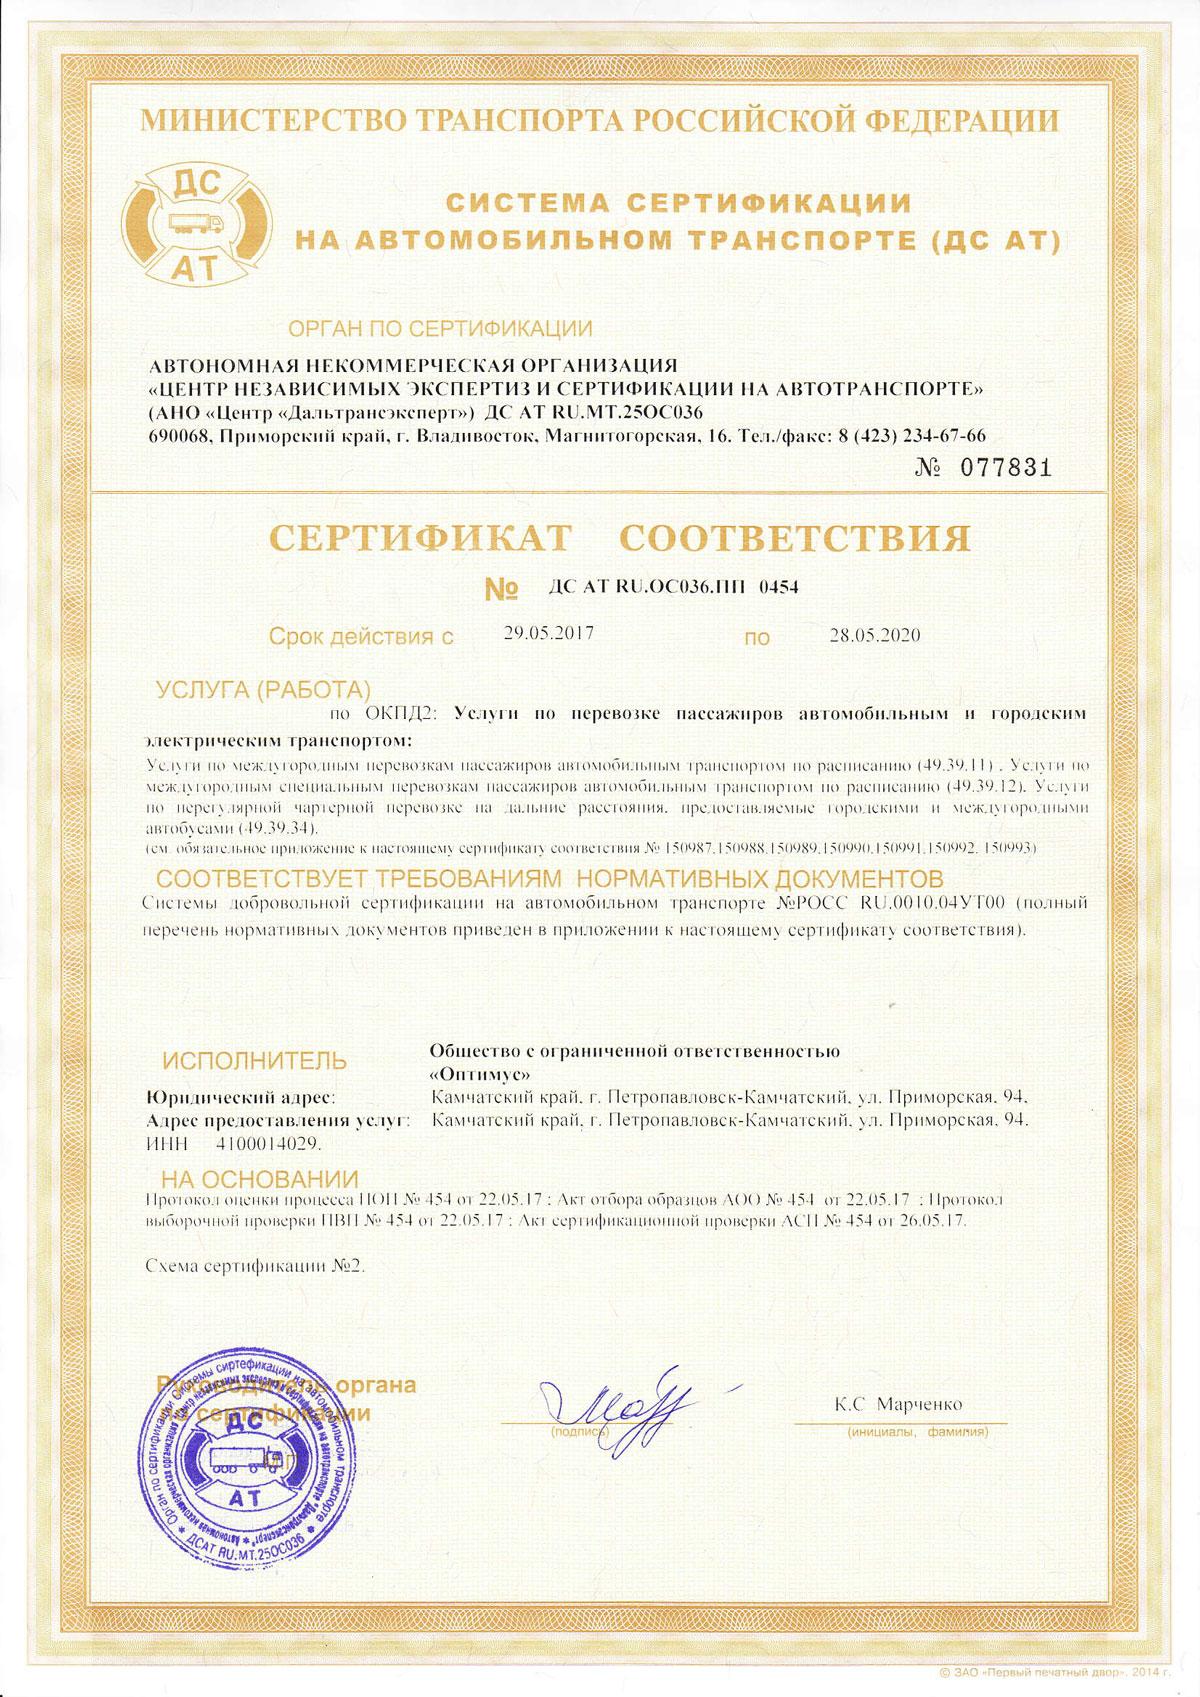 http://autobuspk.ru/files/sertifikat_sootvetstviya.jpg